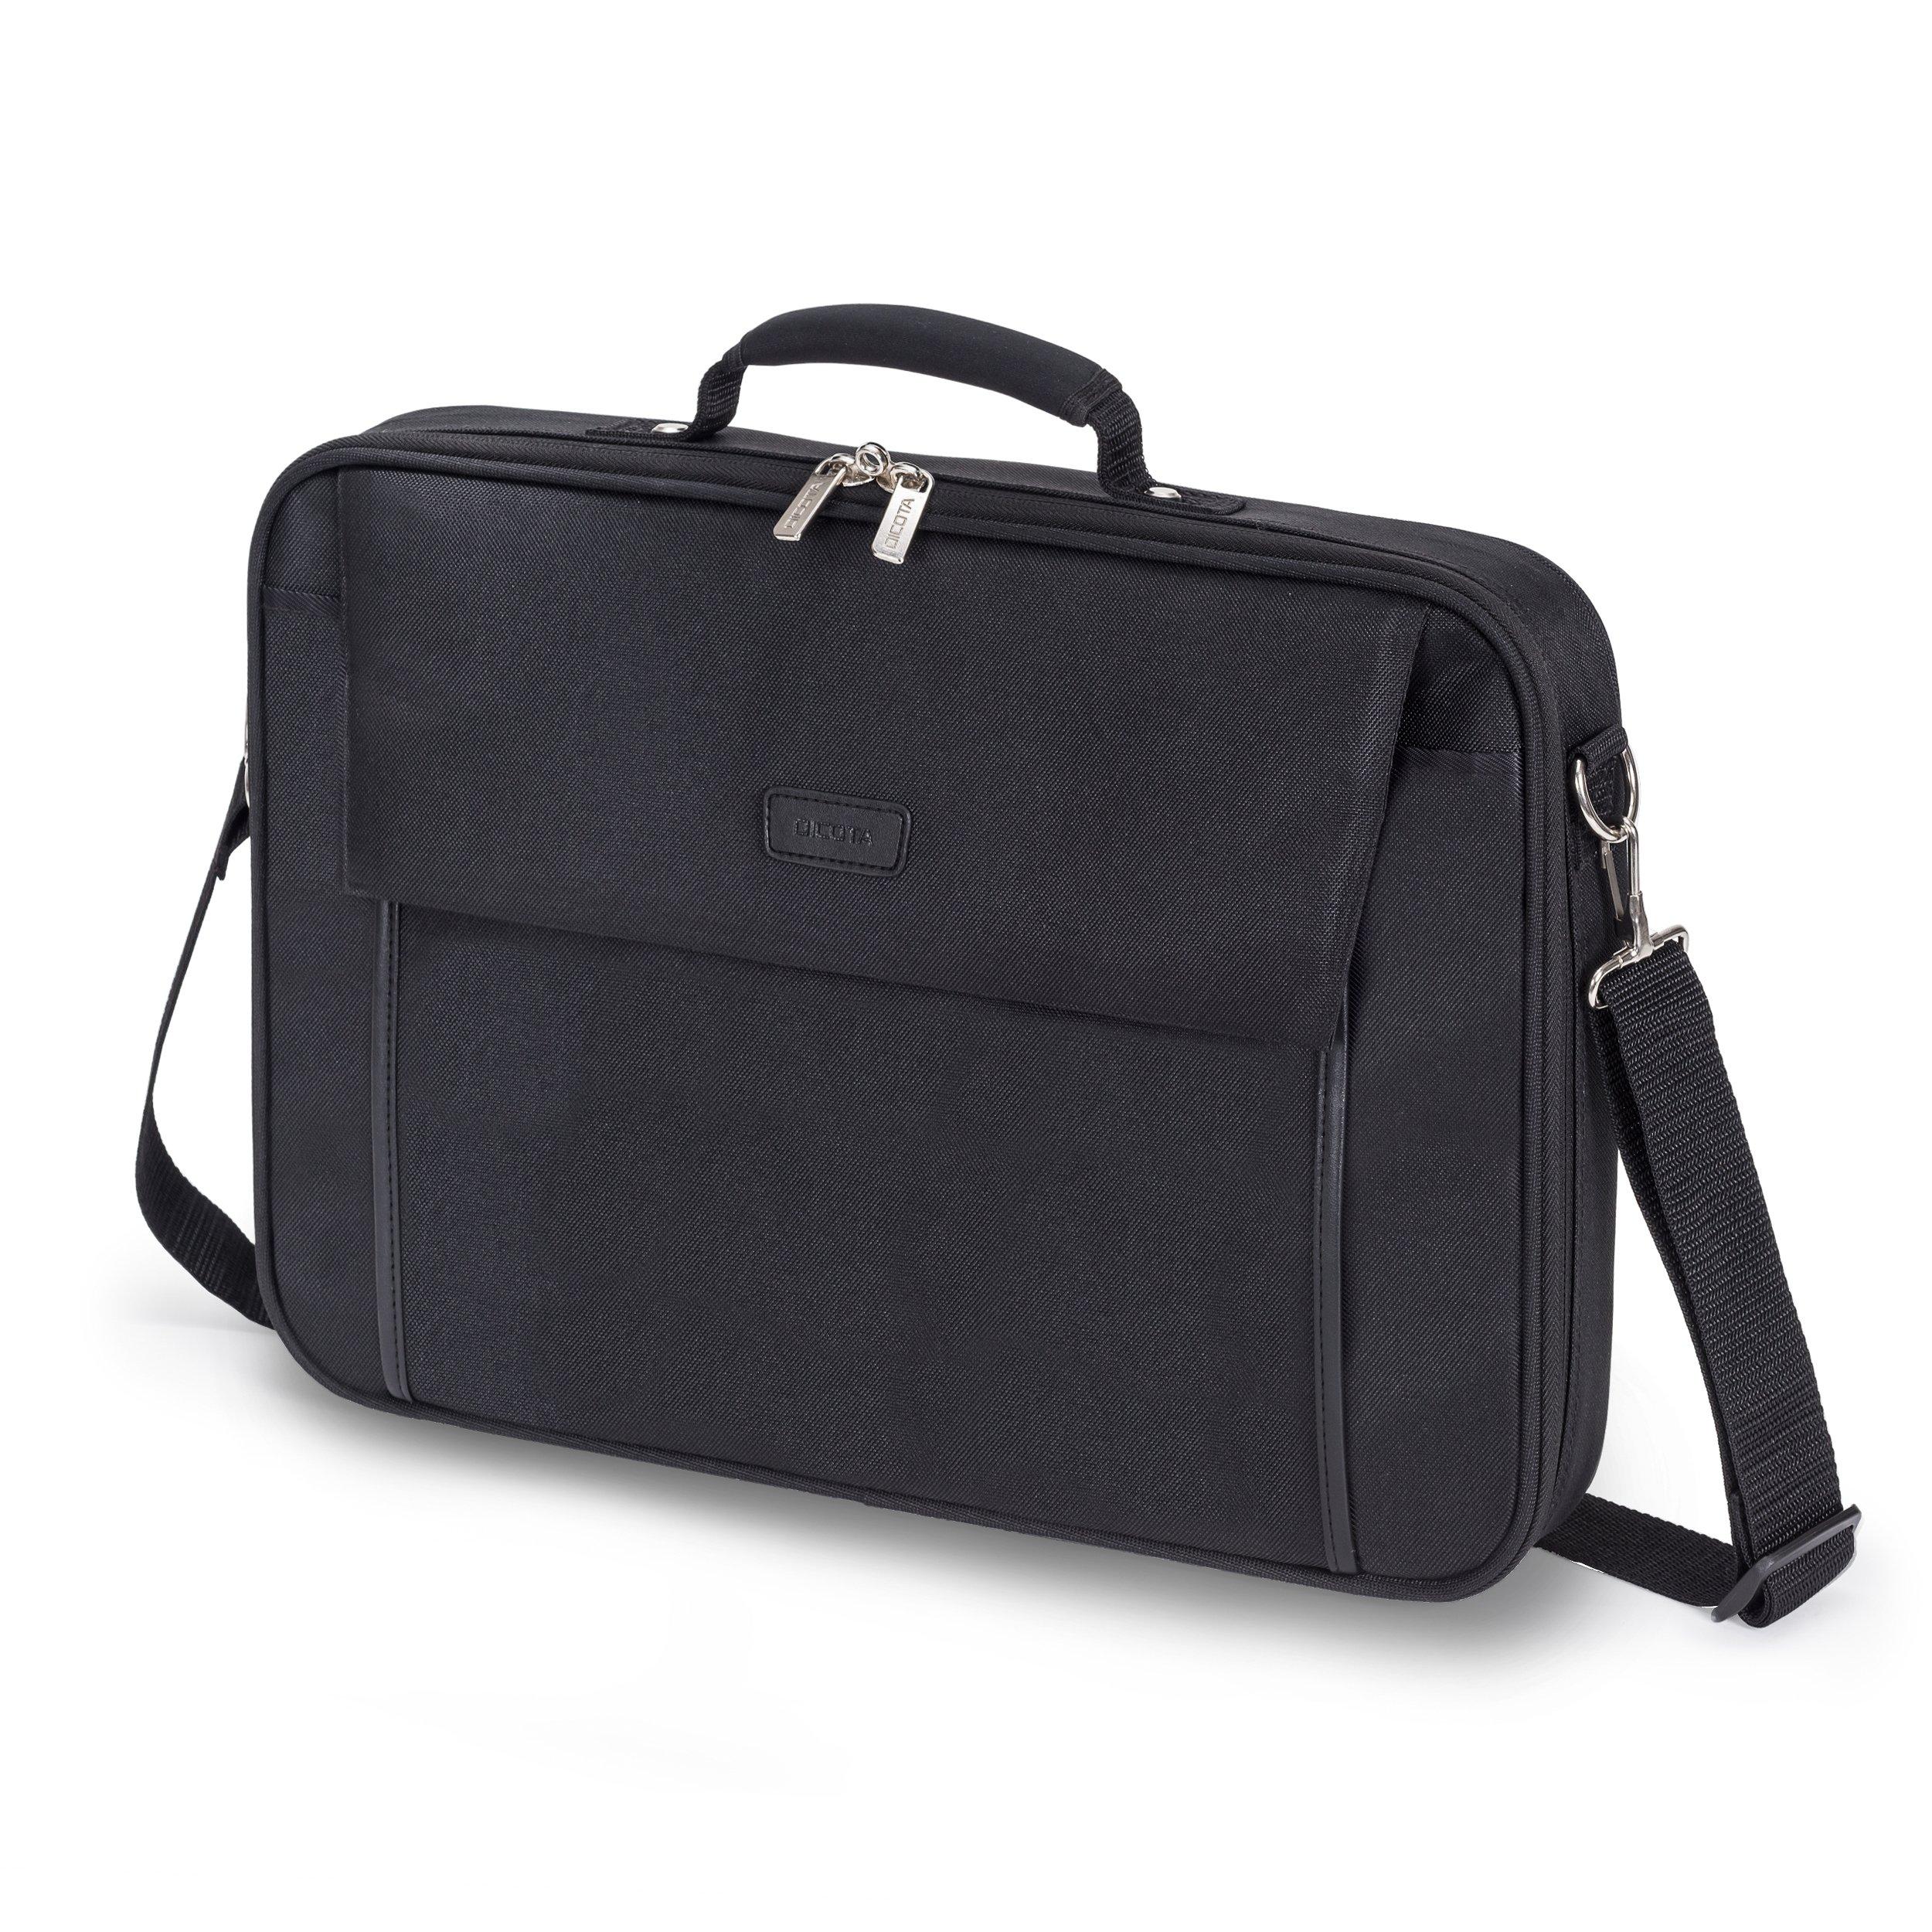 Dicota Base 16-17.3 17.3 Briefcase Black - notebook cases (43.9 cm (17.3), Briefcase, Black, 83